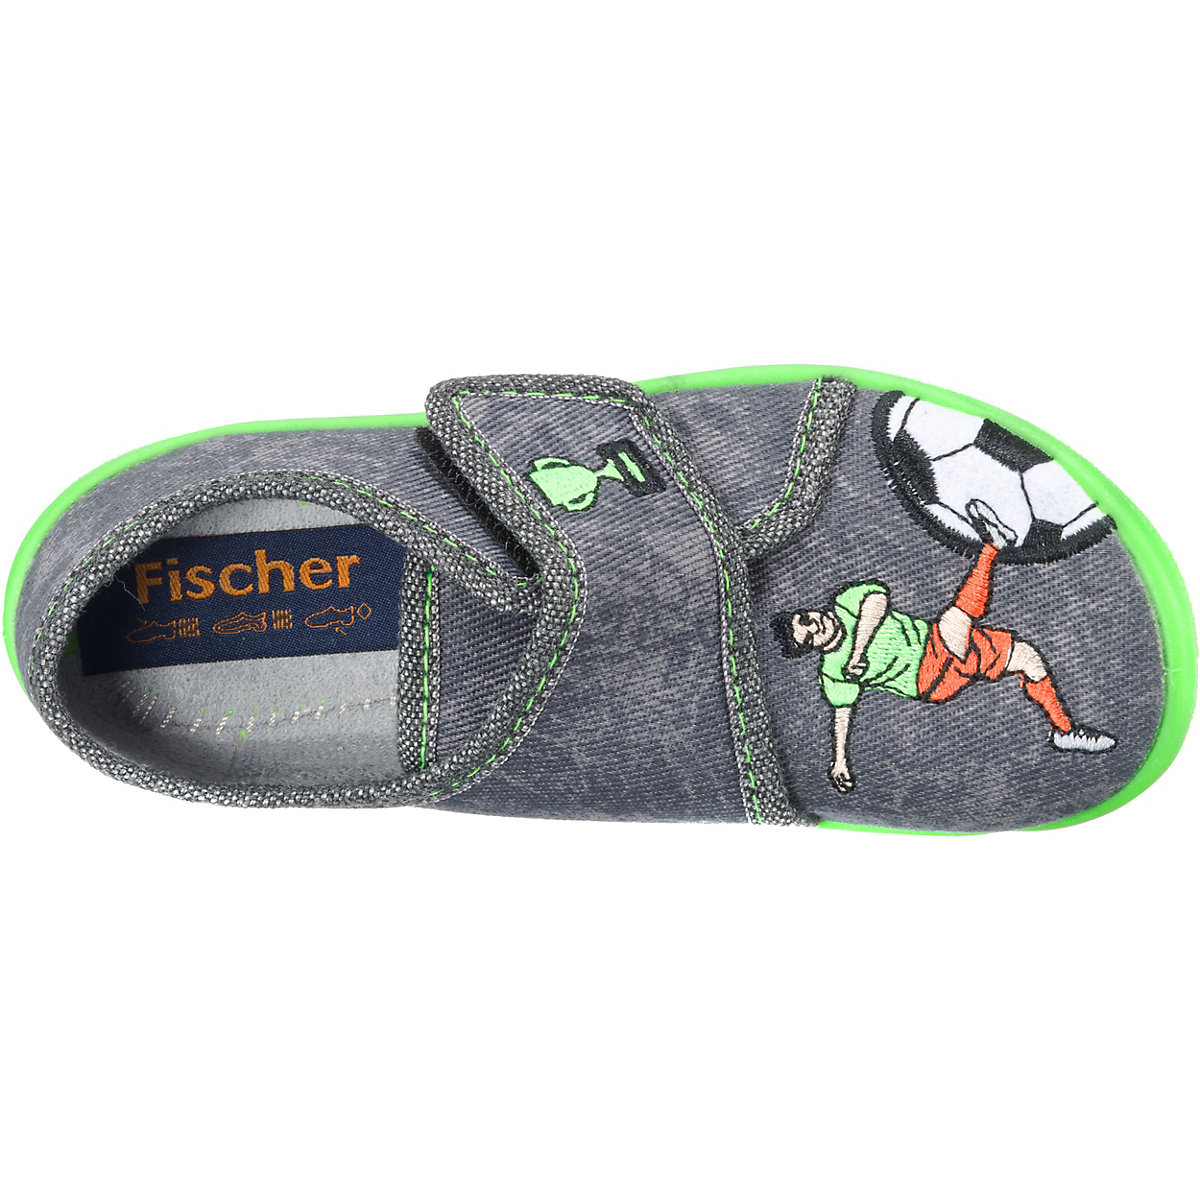 Fischer-markenschuh, Hausschuhe Für Jungen, Fußball, Grau